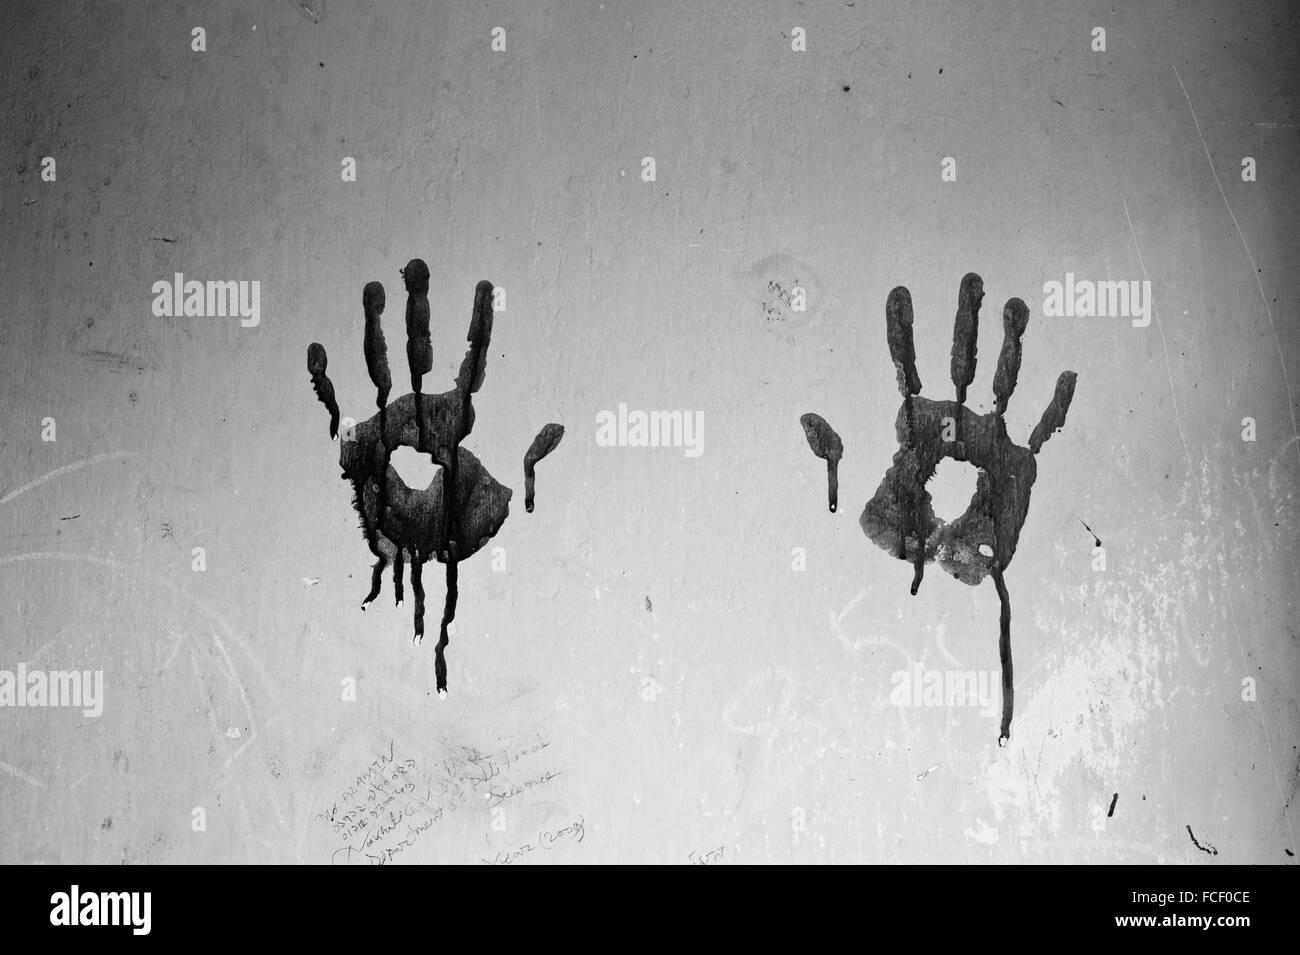 Handabdrücke an Wand Stockbild